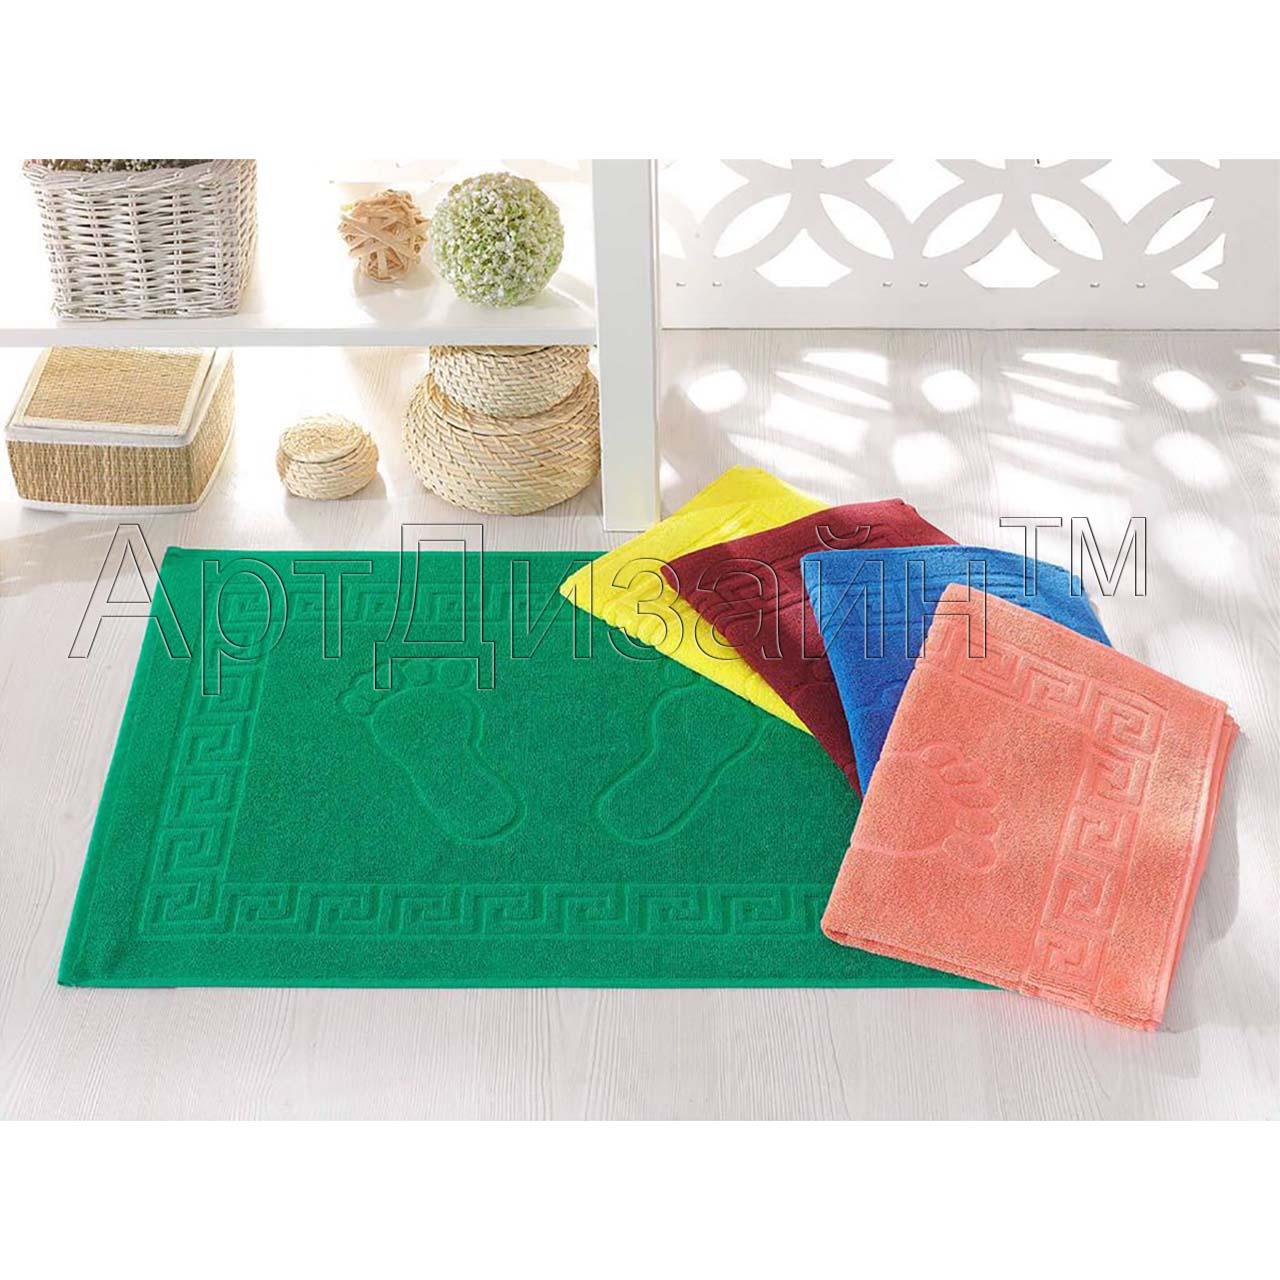 Полотенце Ножки Зеленый р. 50х70Махровые полотенца<br>Плотность ткани: 600 г/кв. м<br><br>Тип: Полотенце<br>Размер: 50х70<br>Материал: Махра